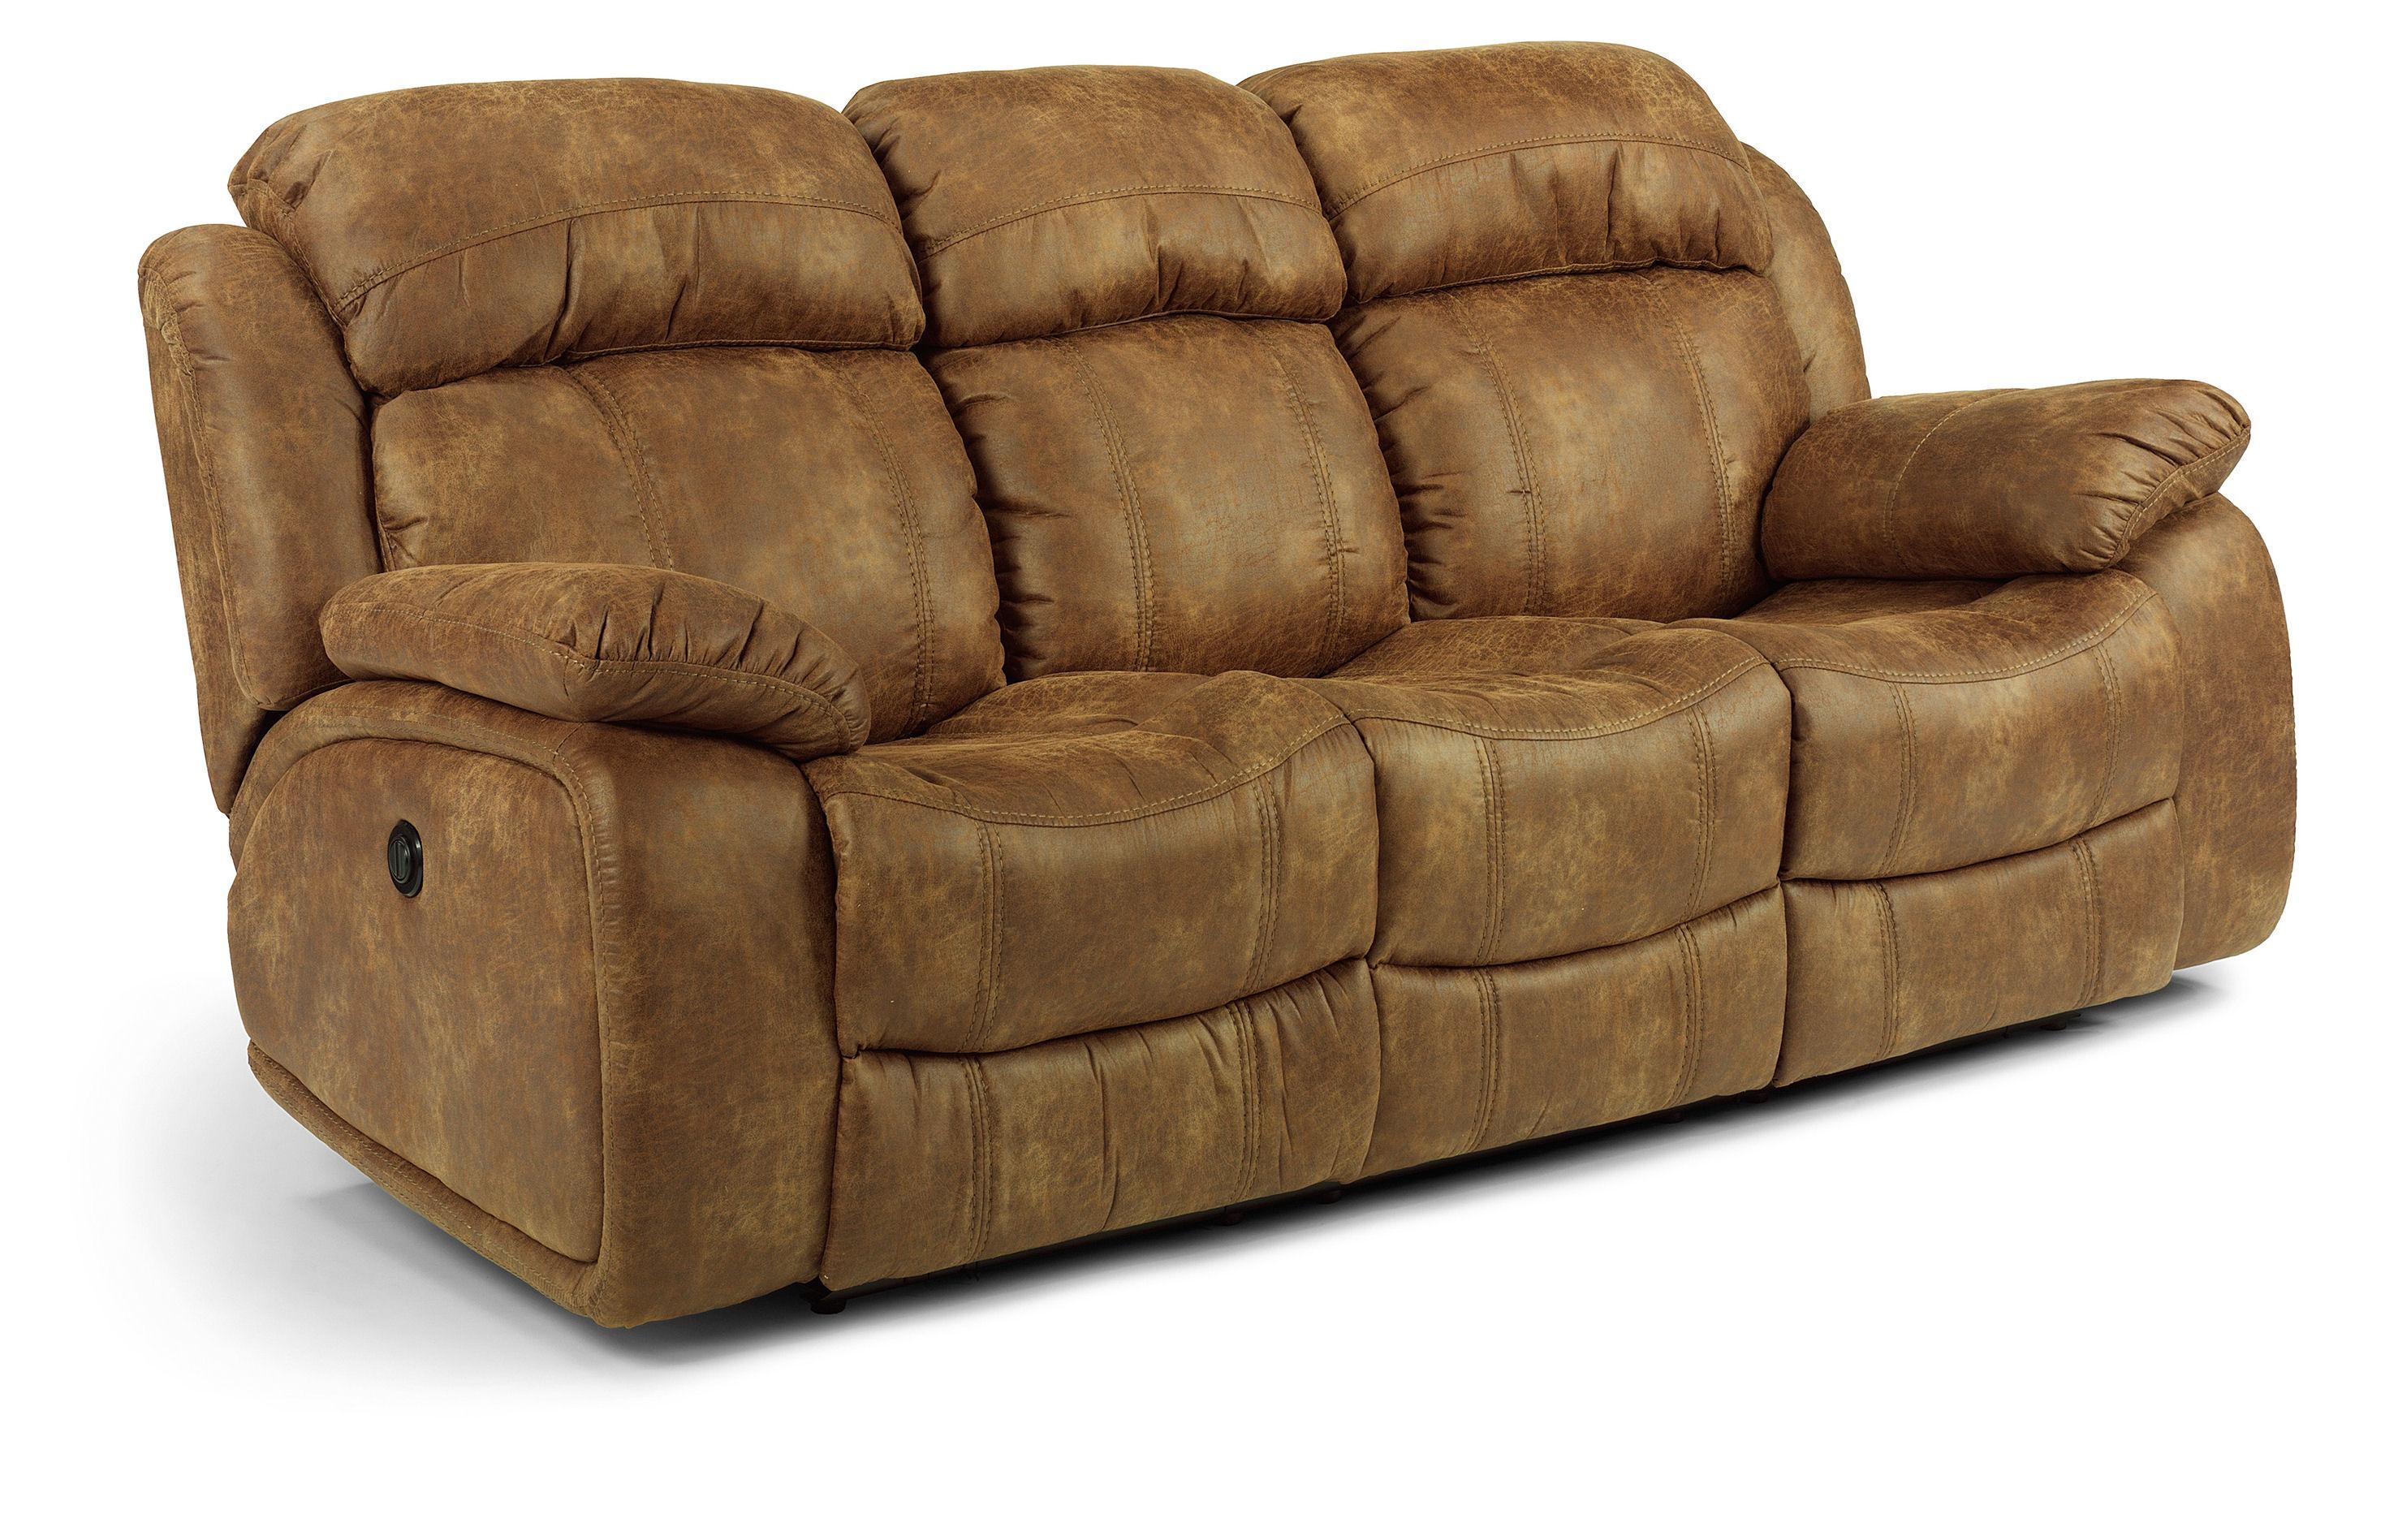 Flexsteel Latitudes-Como Double Power Reclining Sofa - Item Number: 1408-62P